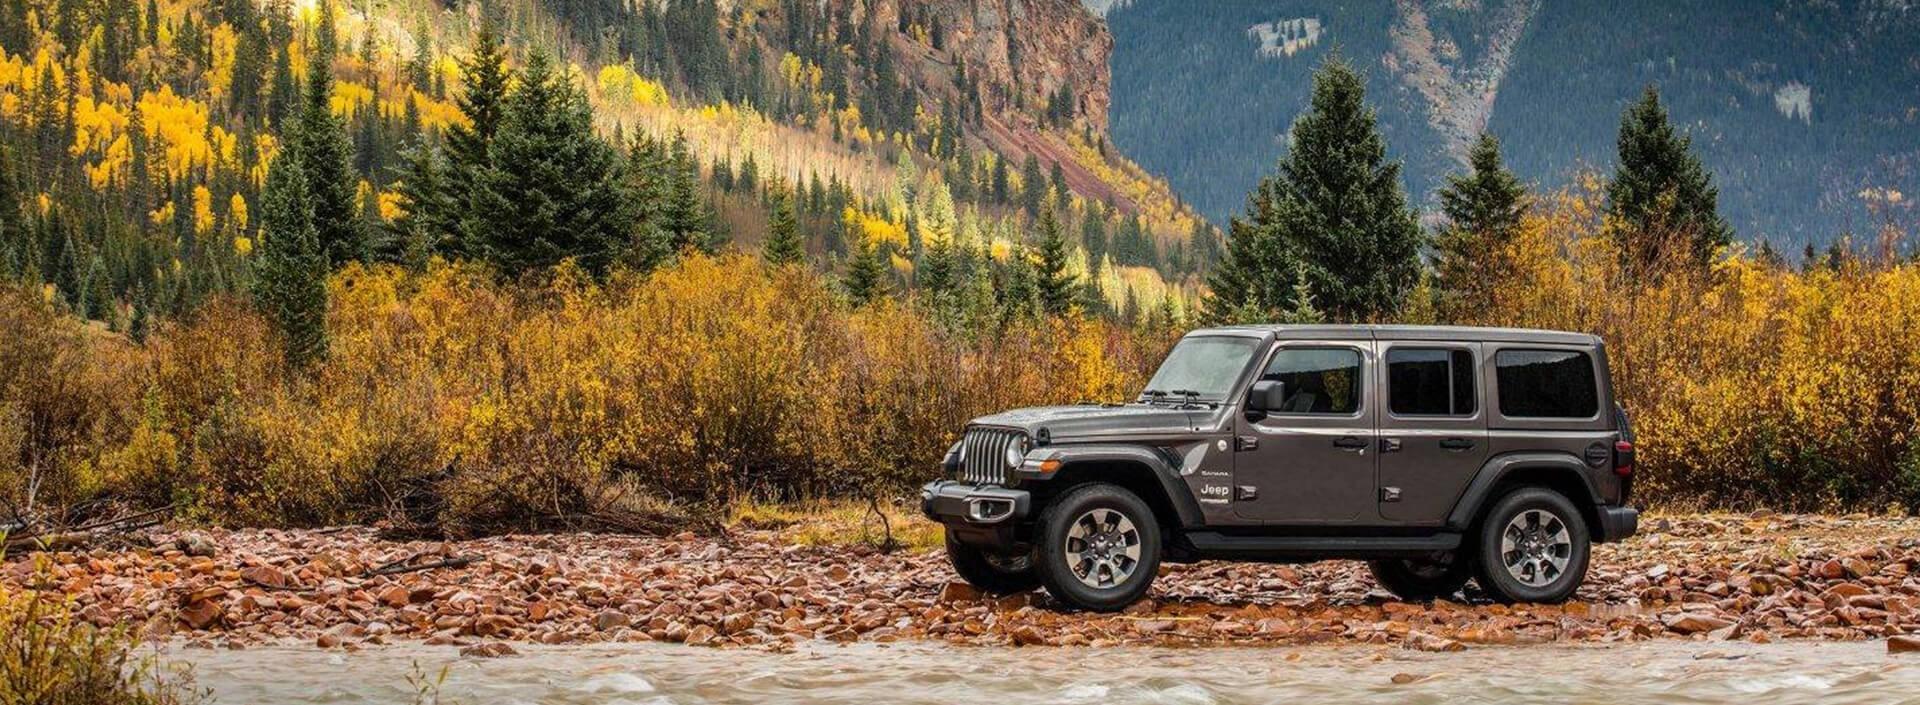 Car Dealerships In Longview Tx >> Randall Dodge Chrysler Jeep Ram Longview, Nacogdoches, Tyler TX, Jacksonville TX | New & Used ...